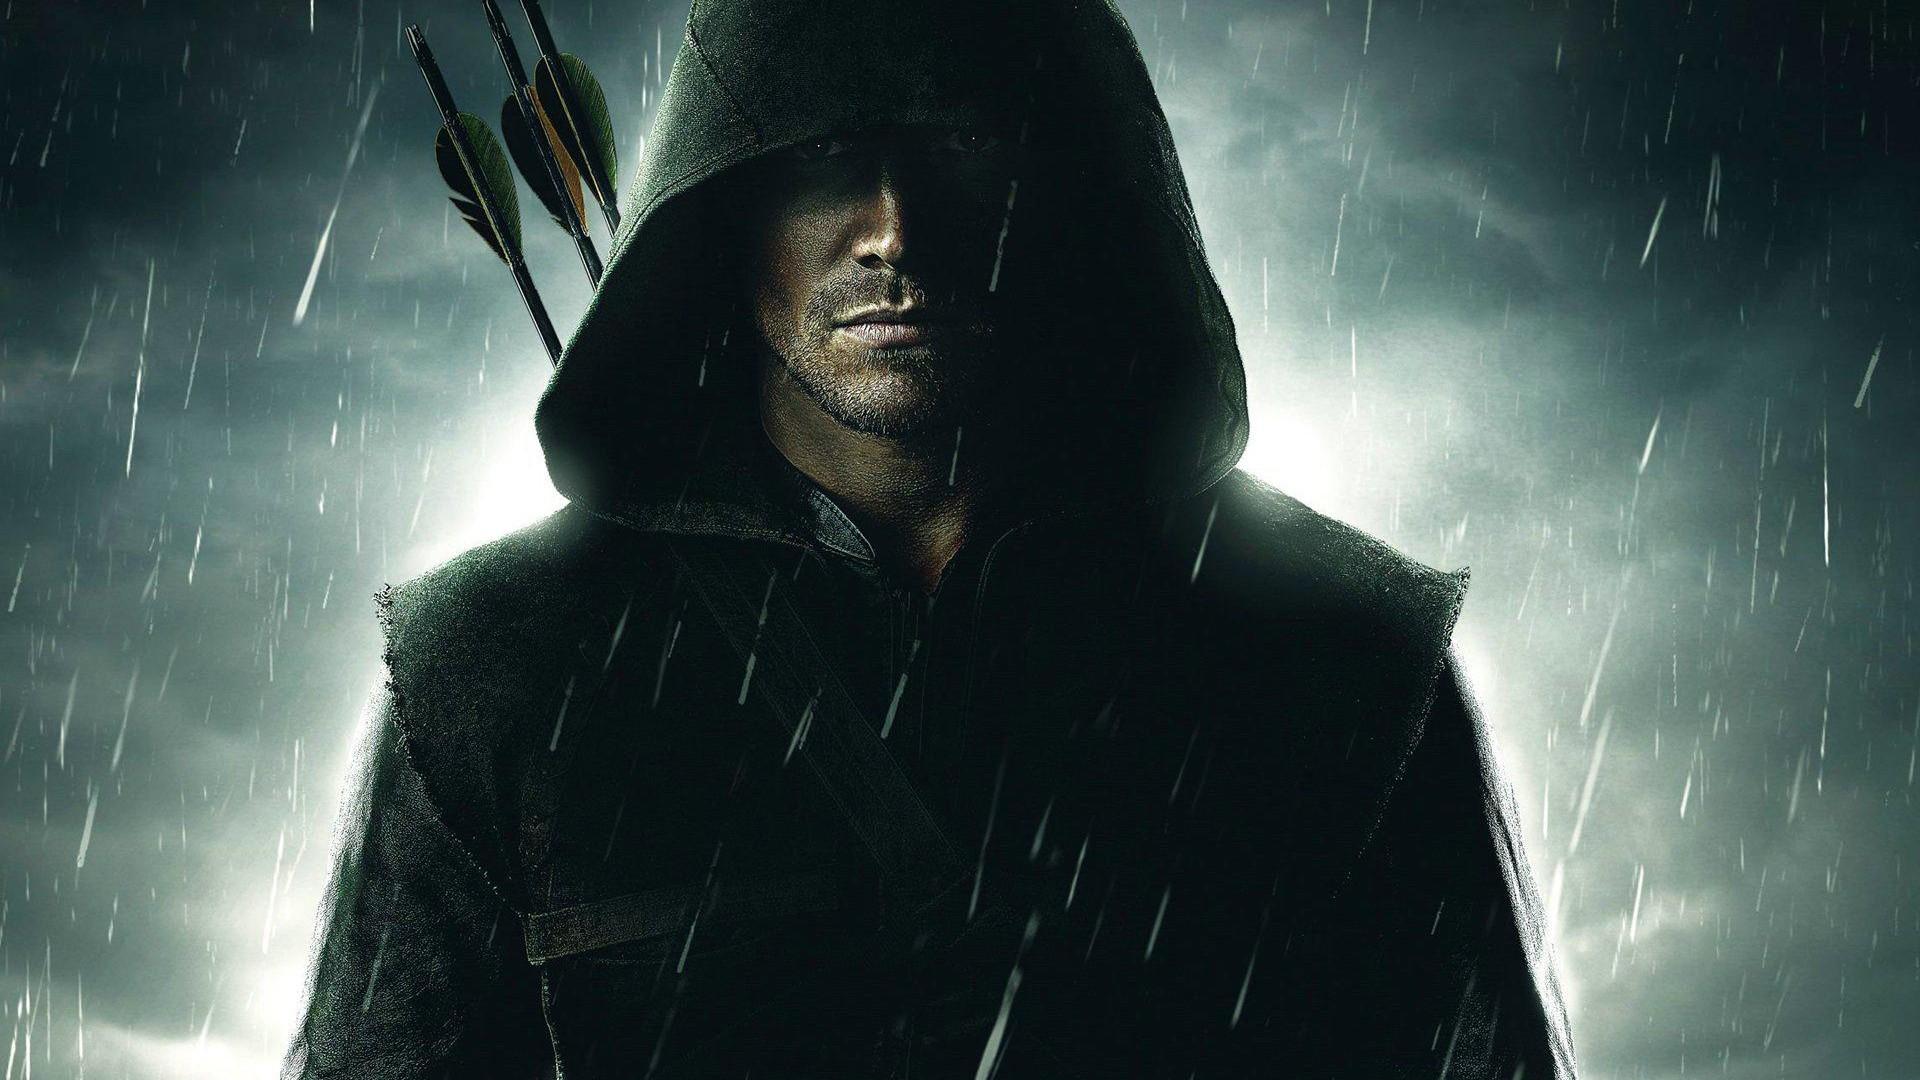 Green Arrow Action Hero Wallpaper HD Wallpaper